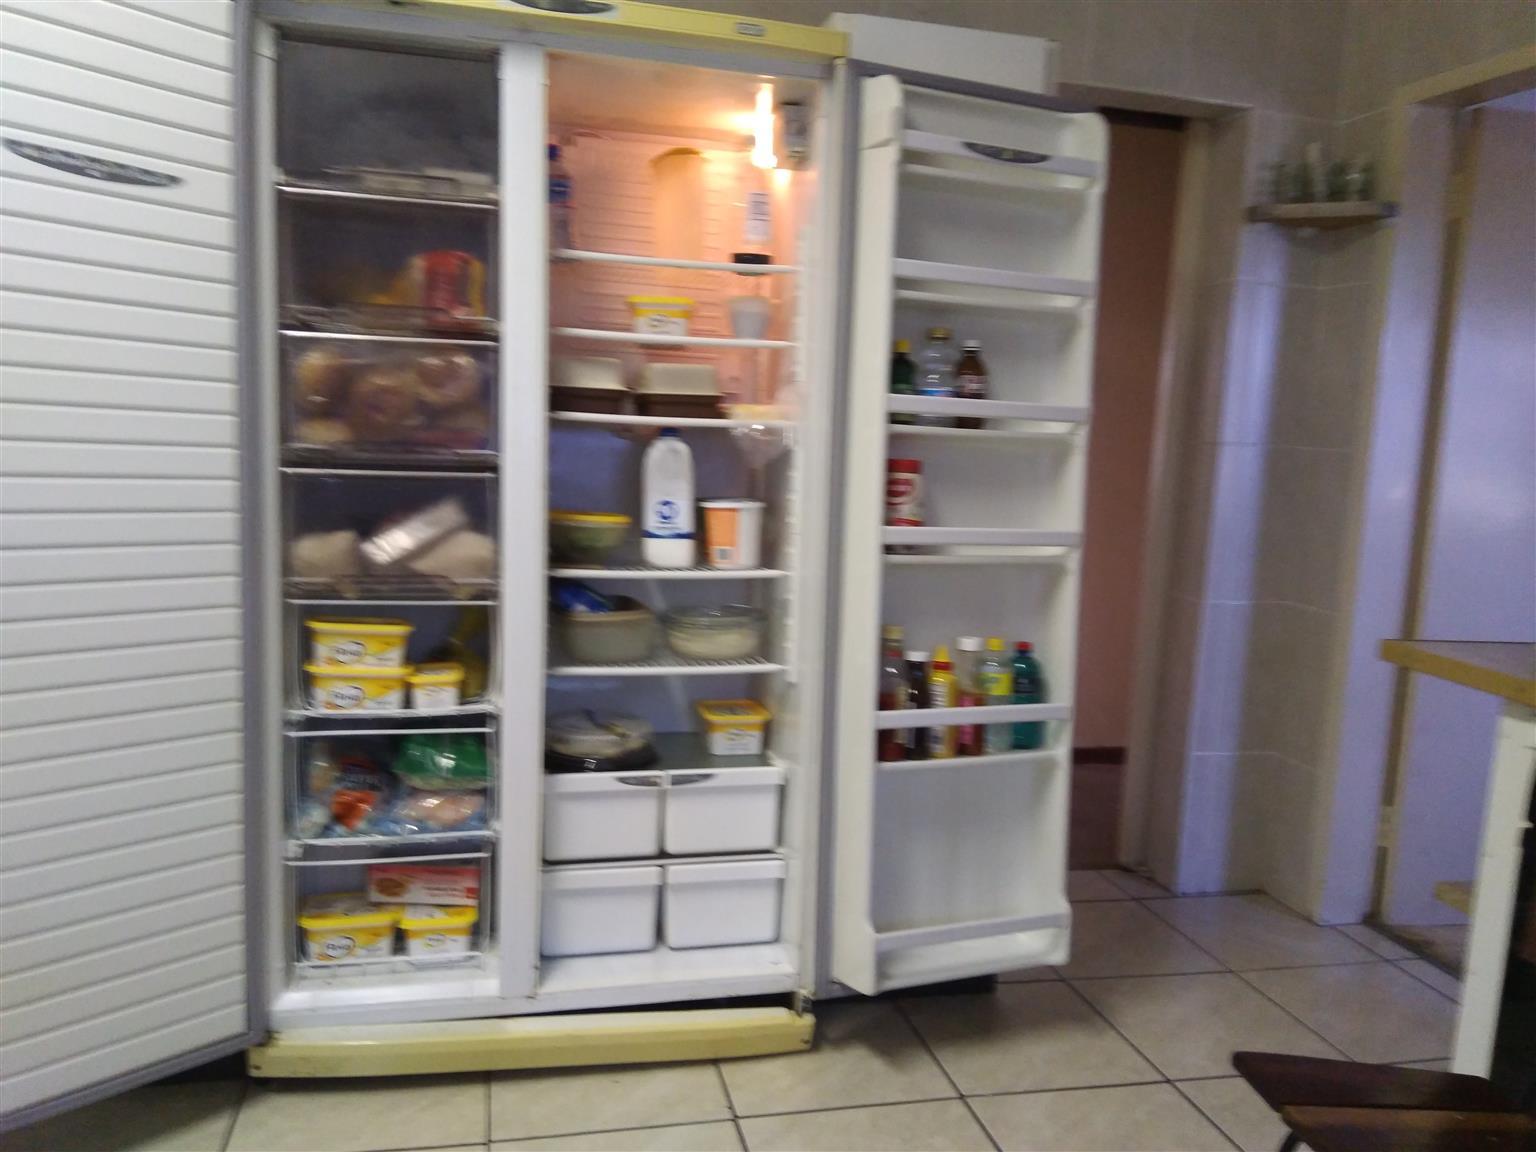 Fridge/freezer